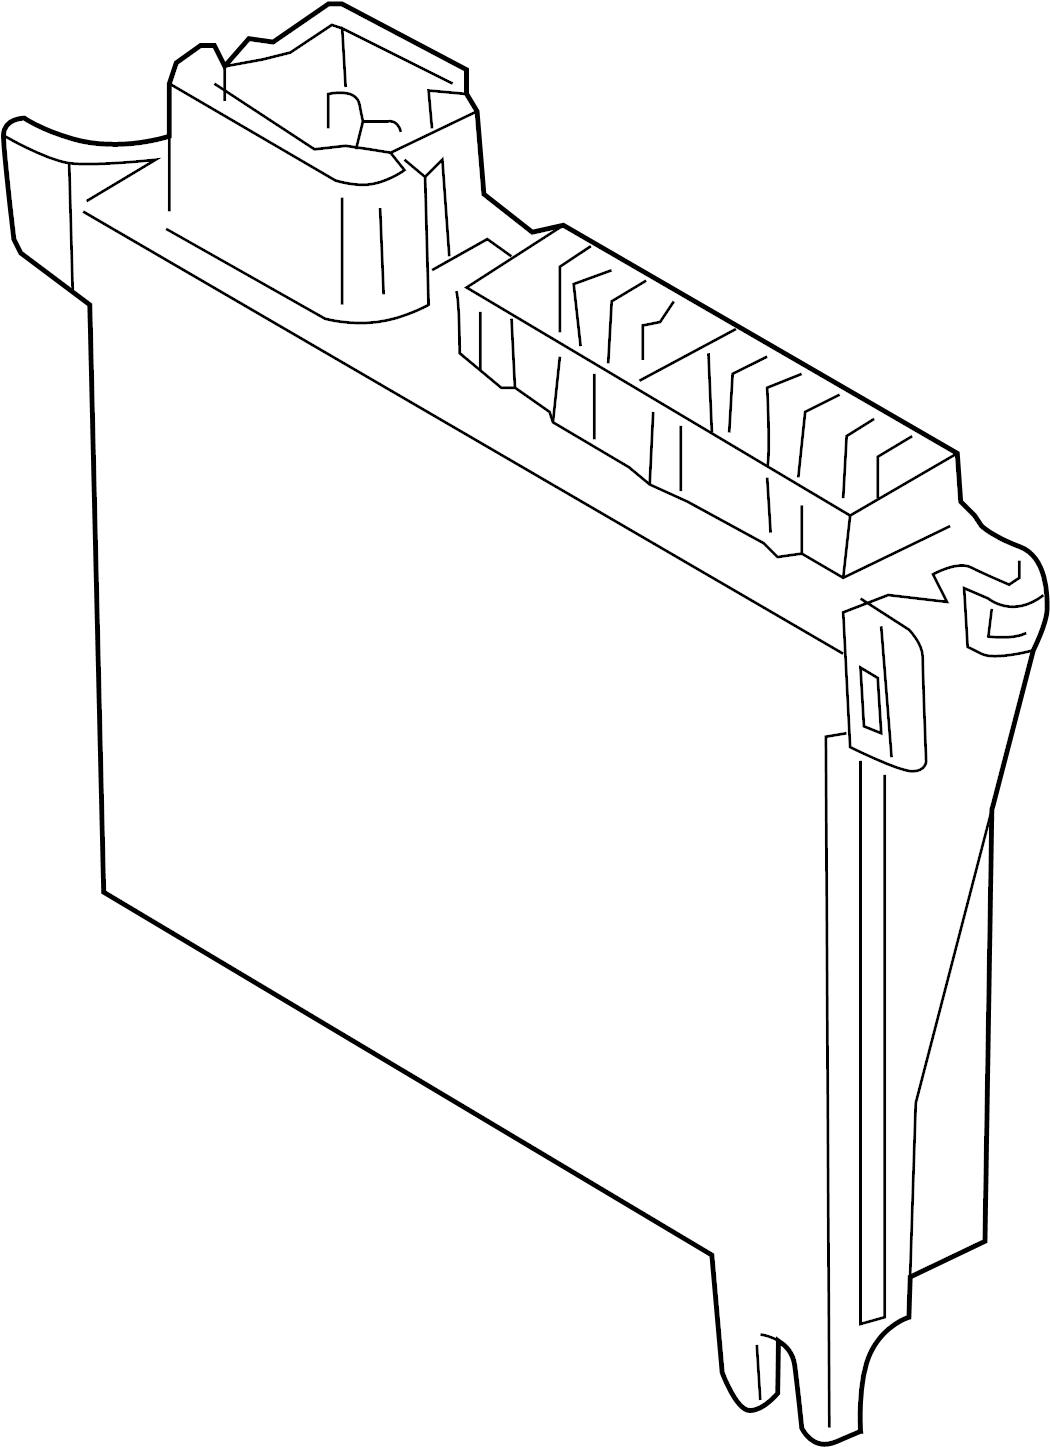 Gm Ignition Module Wiring - Function Wiring Diagram